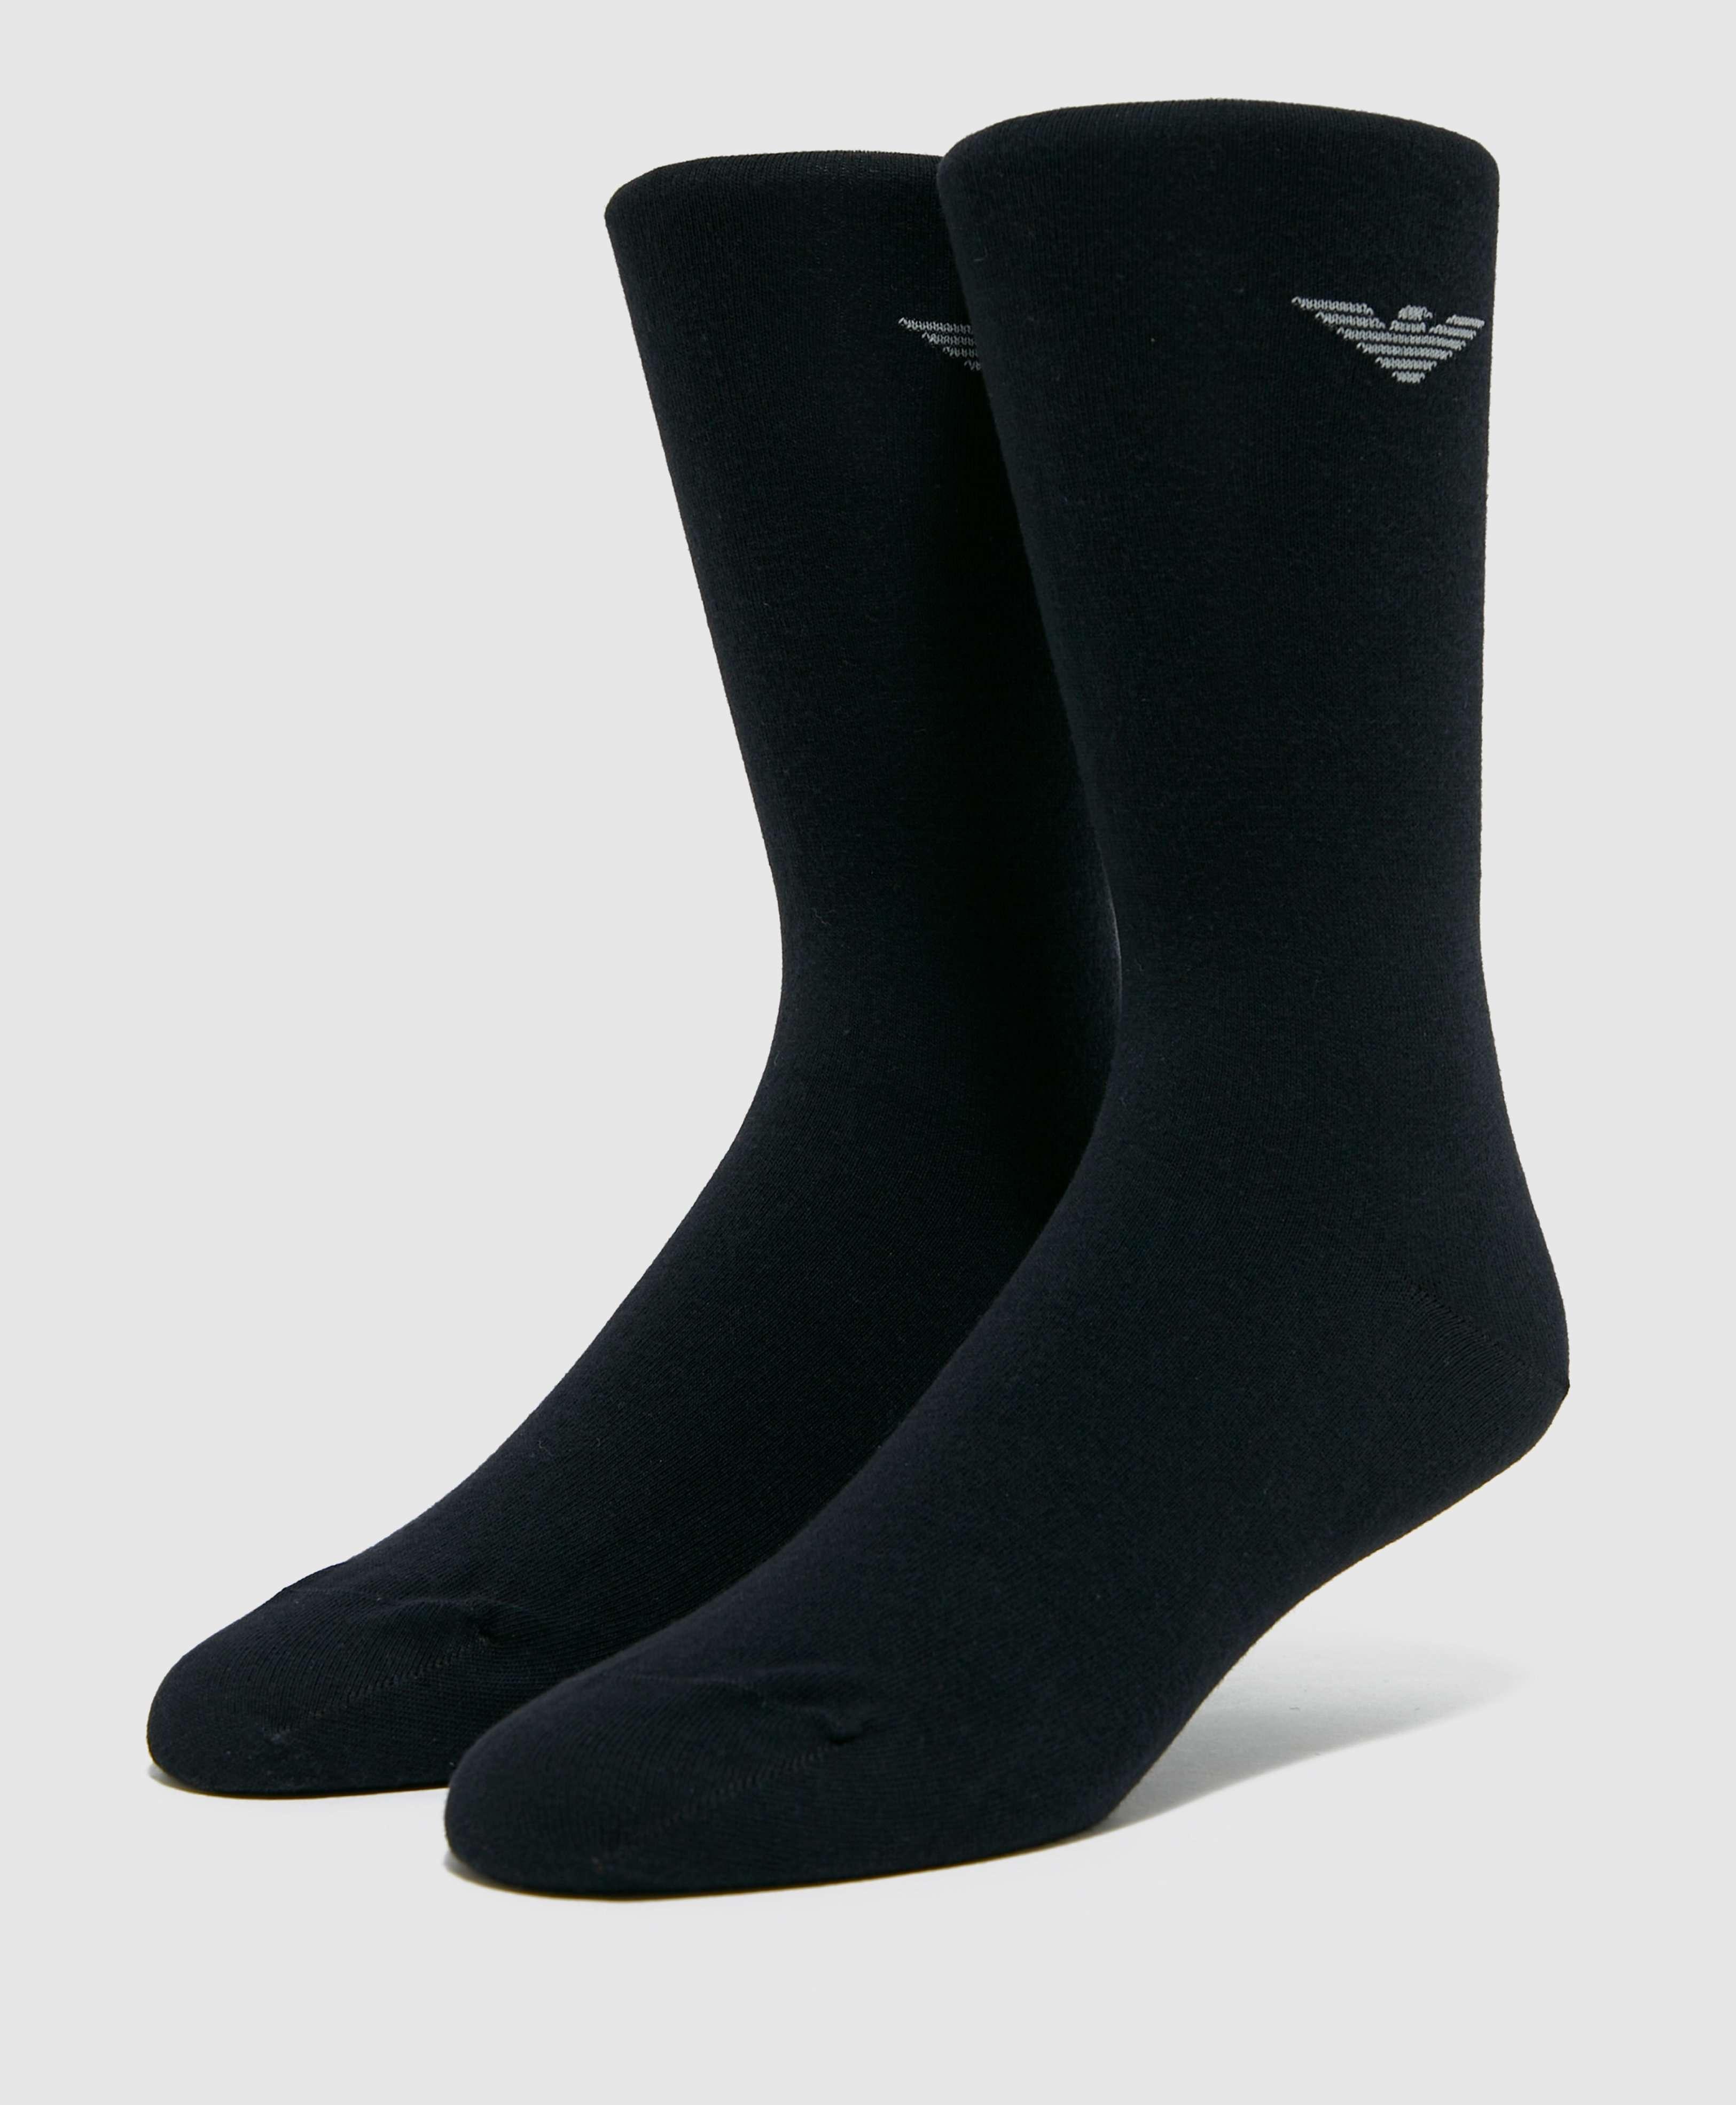 Emporio Armani 2-Pack Eagle Socks